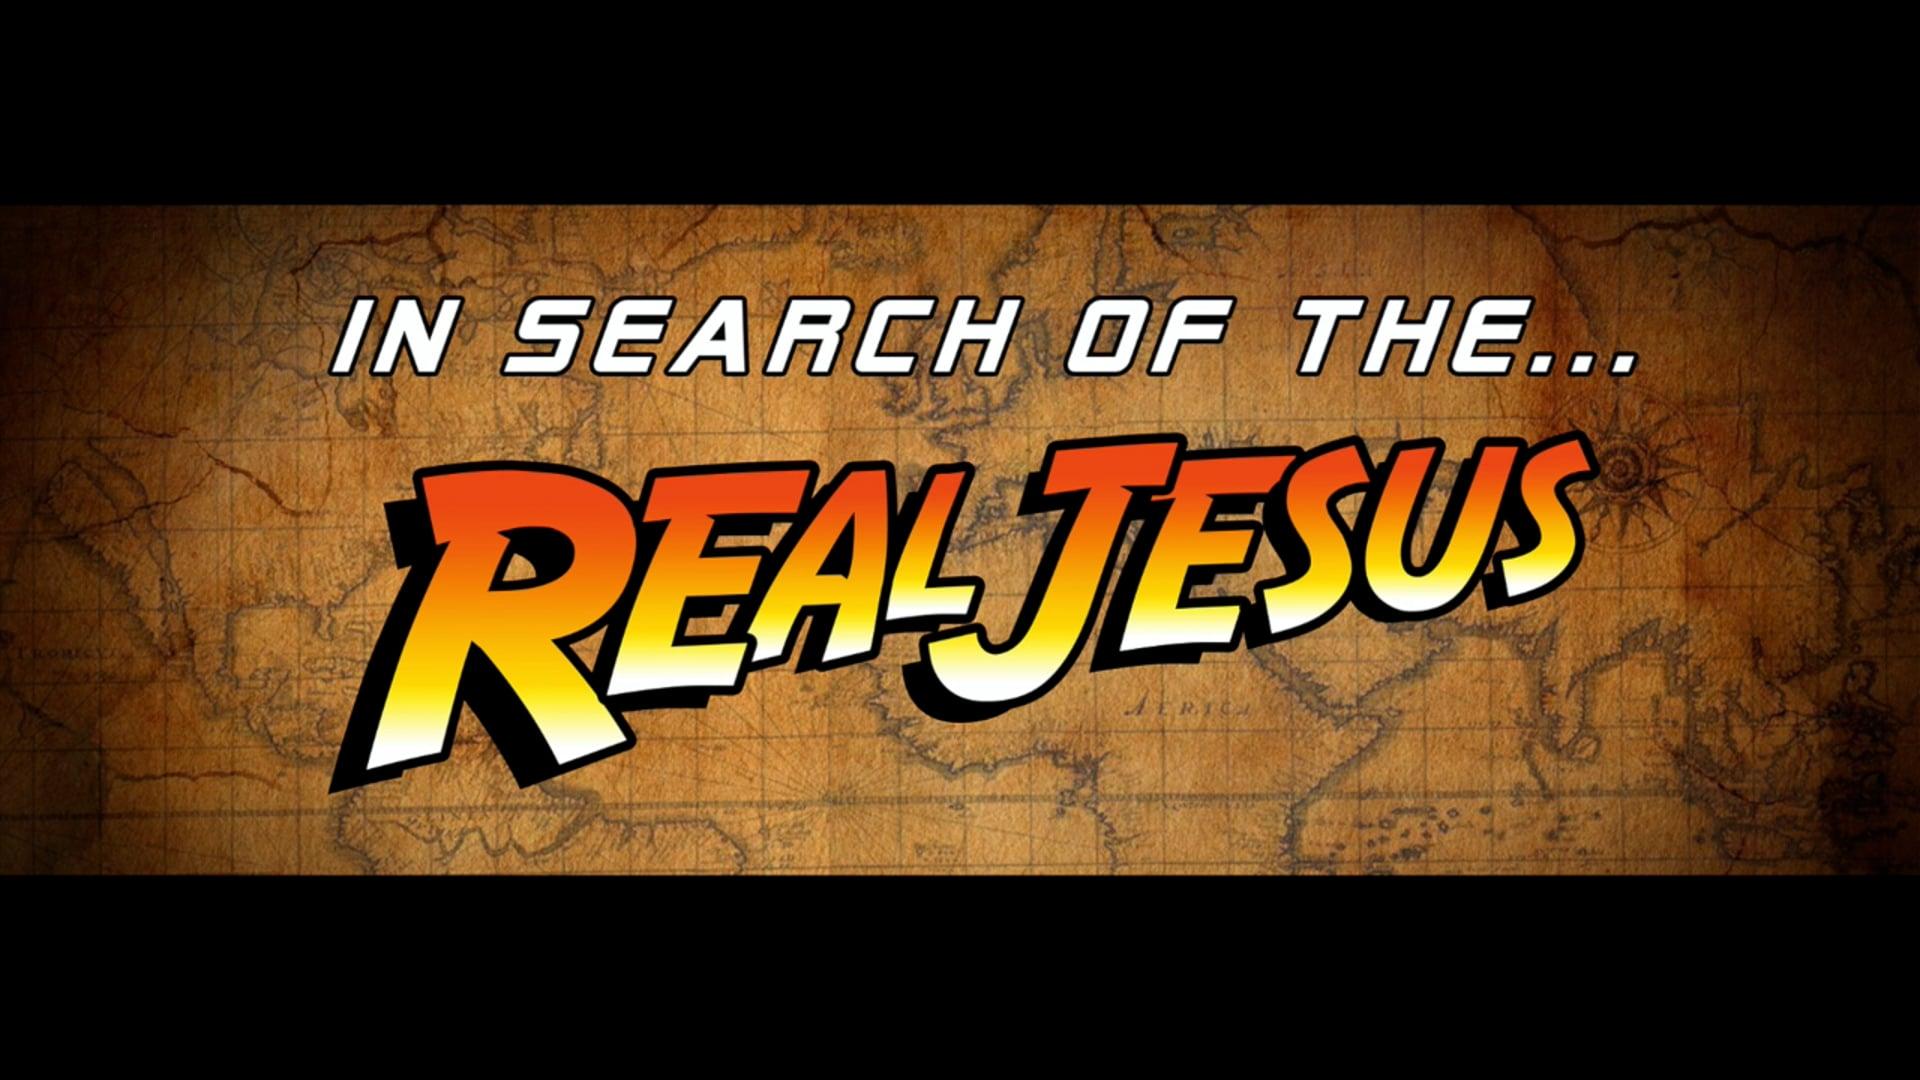 In Search of the Real Jesus - Tabernacles/Jewish Leaders - Shepherd